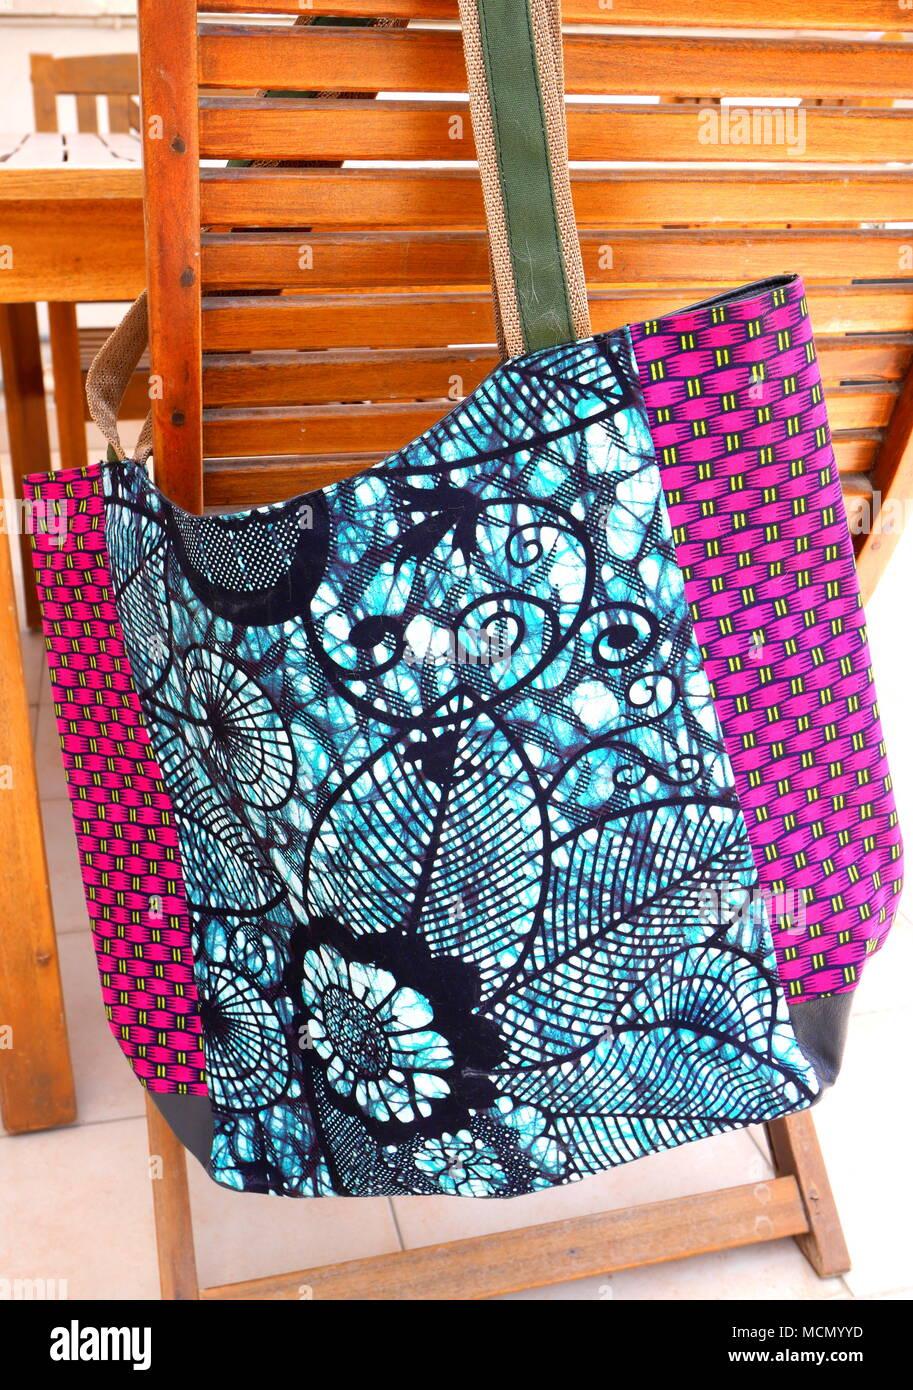 Colourful Tanzanian bag made out of kitenge fabric - Stock Image